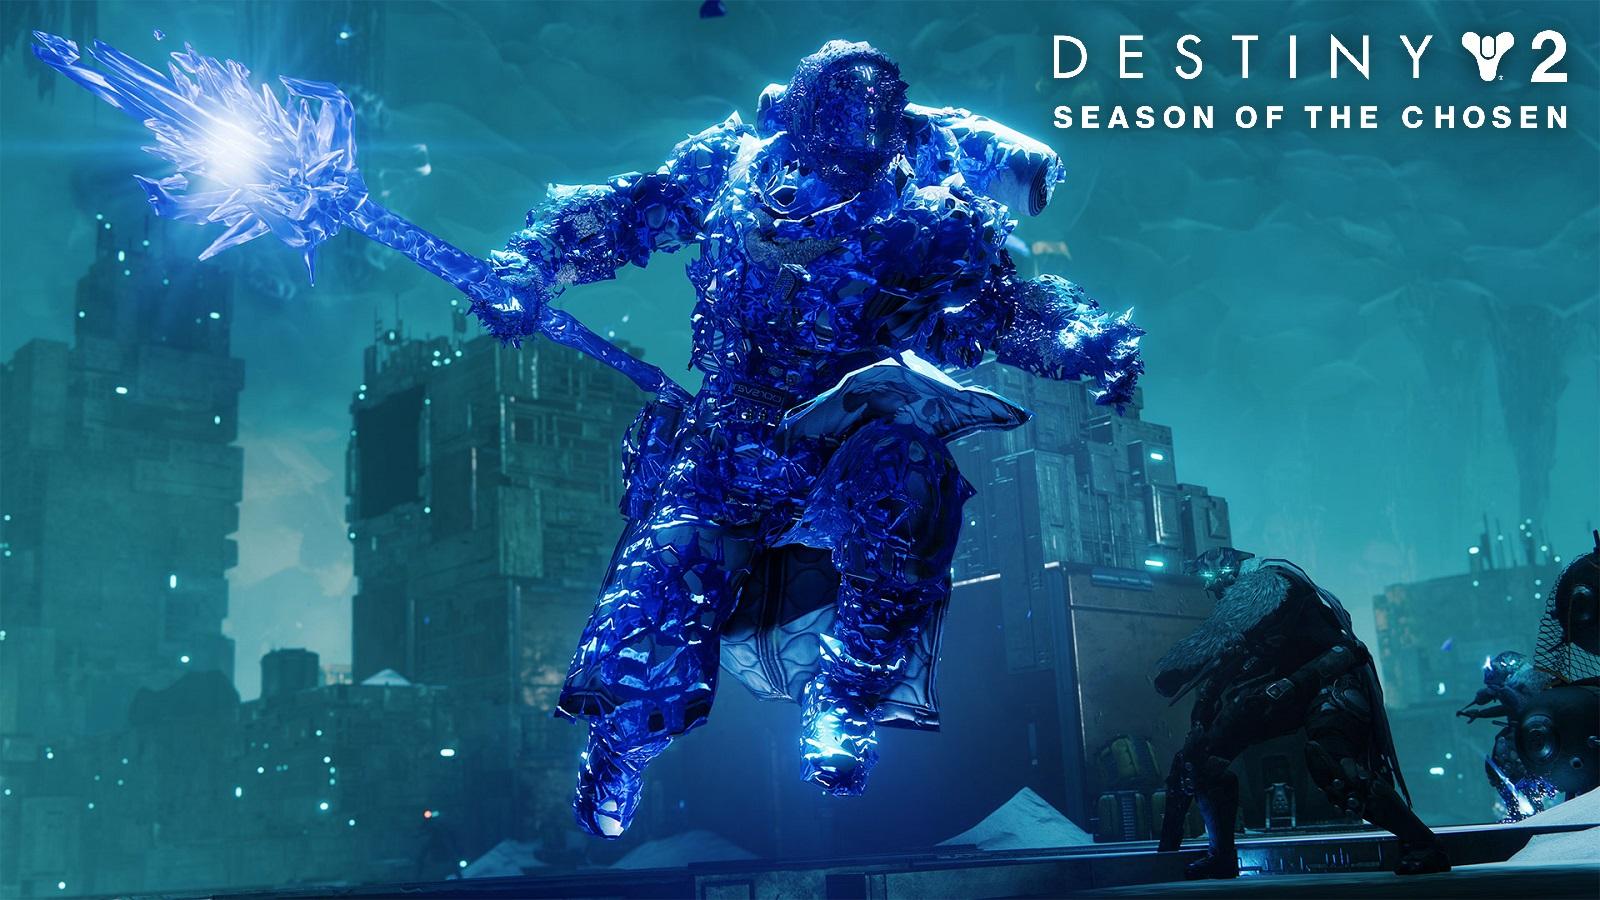 Destiny 2 Stasis Shadebinder Warlock With Season of the Chosen Text